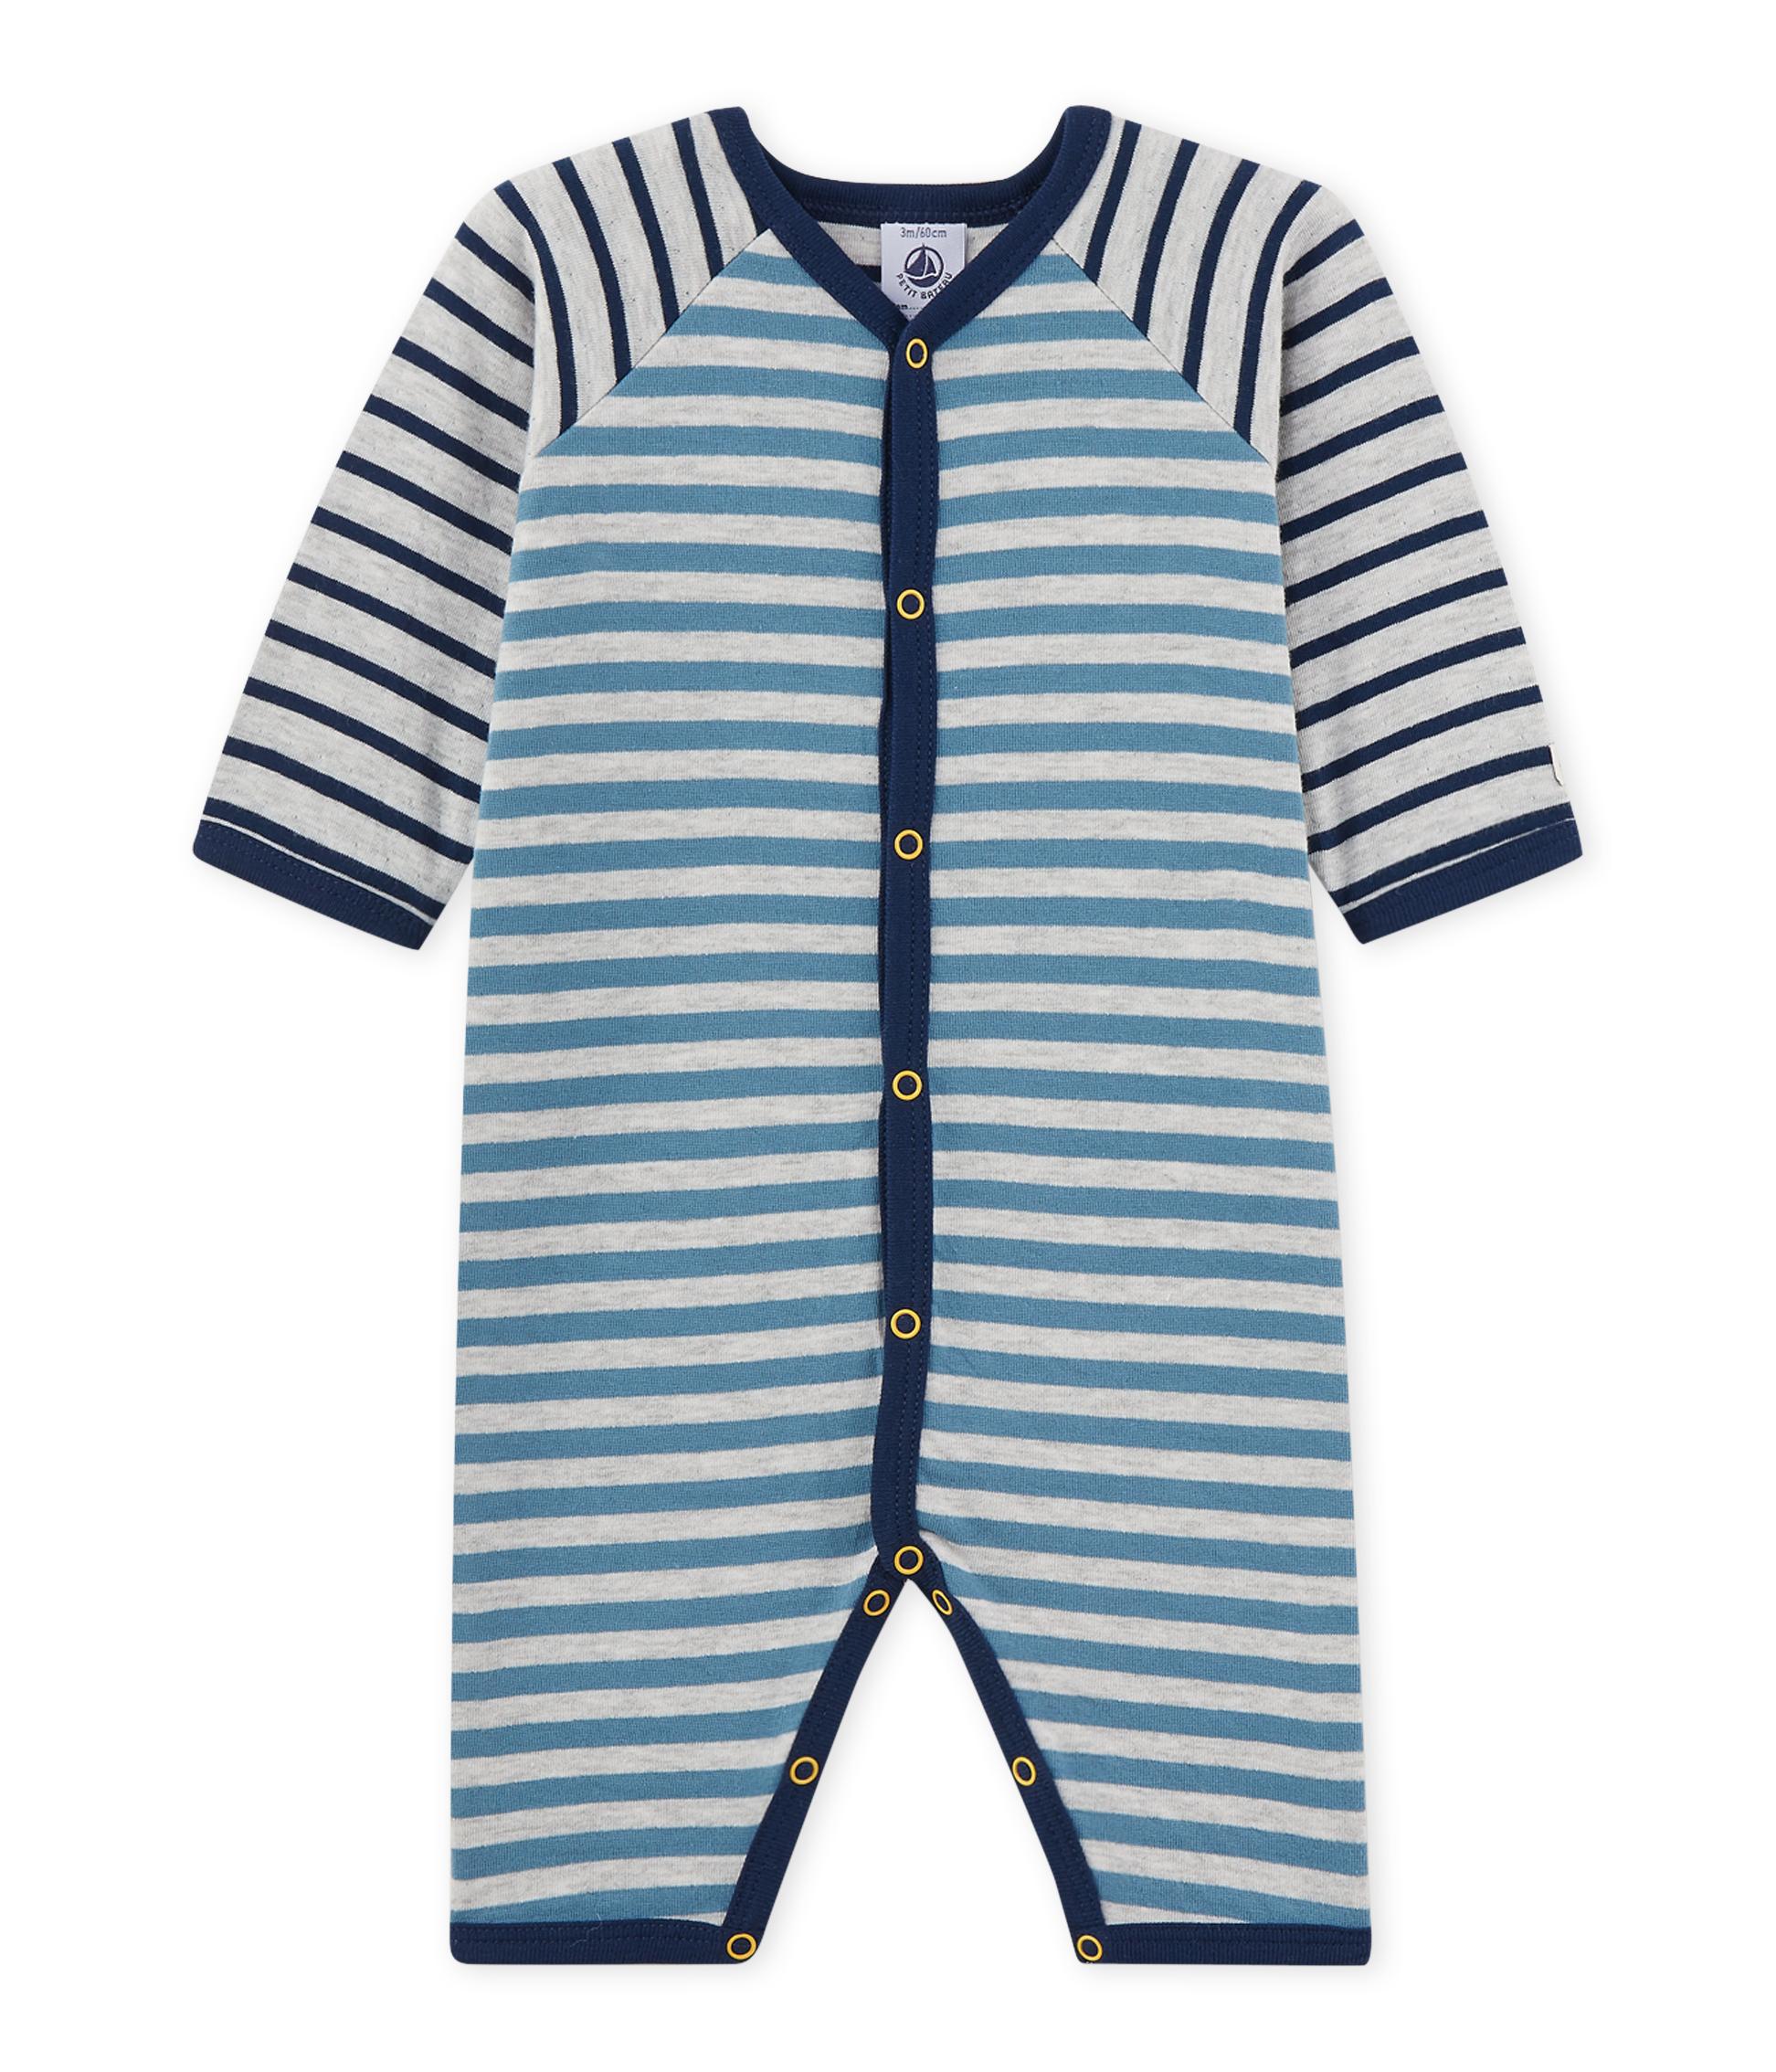 52158c1d4 Pijama de rayas sin pies para bebé niño | Petit Bateau